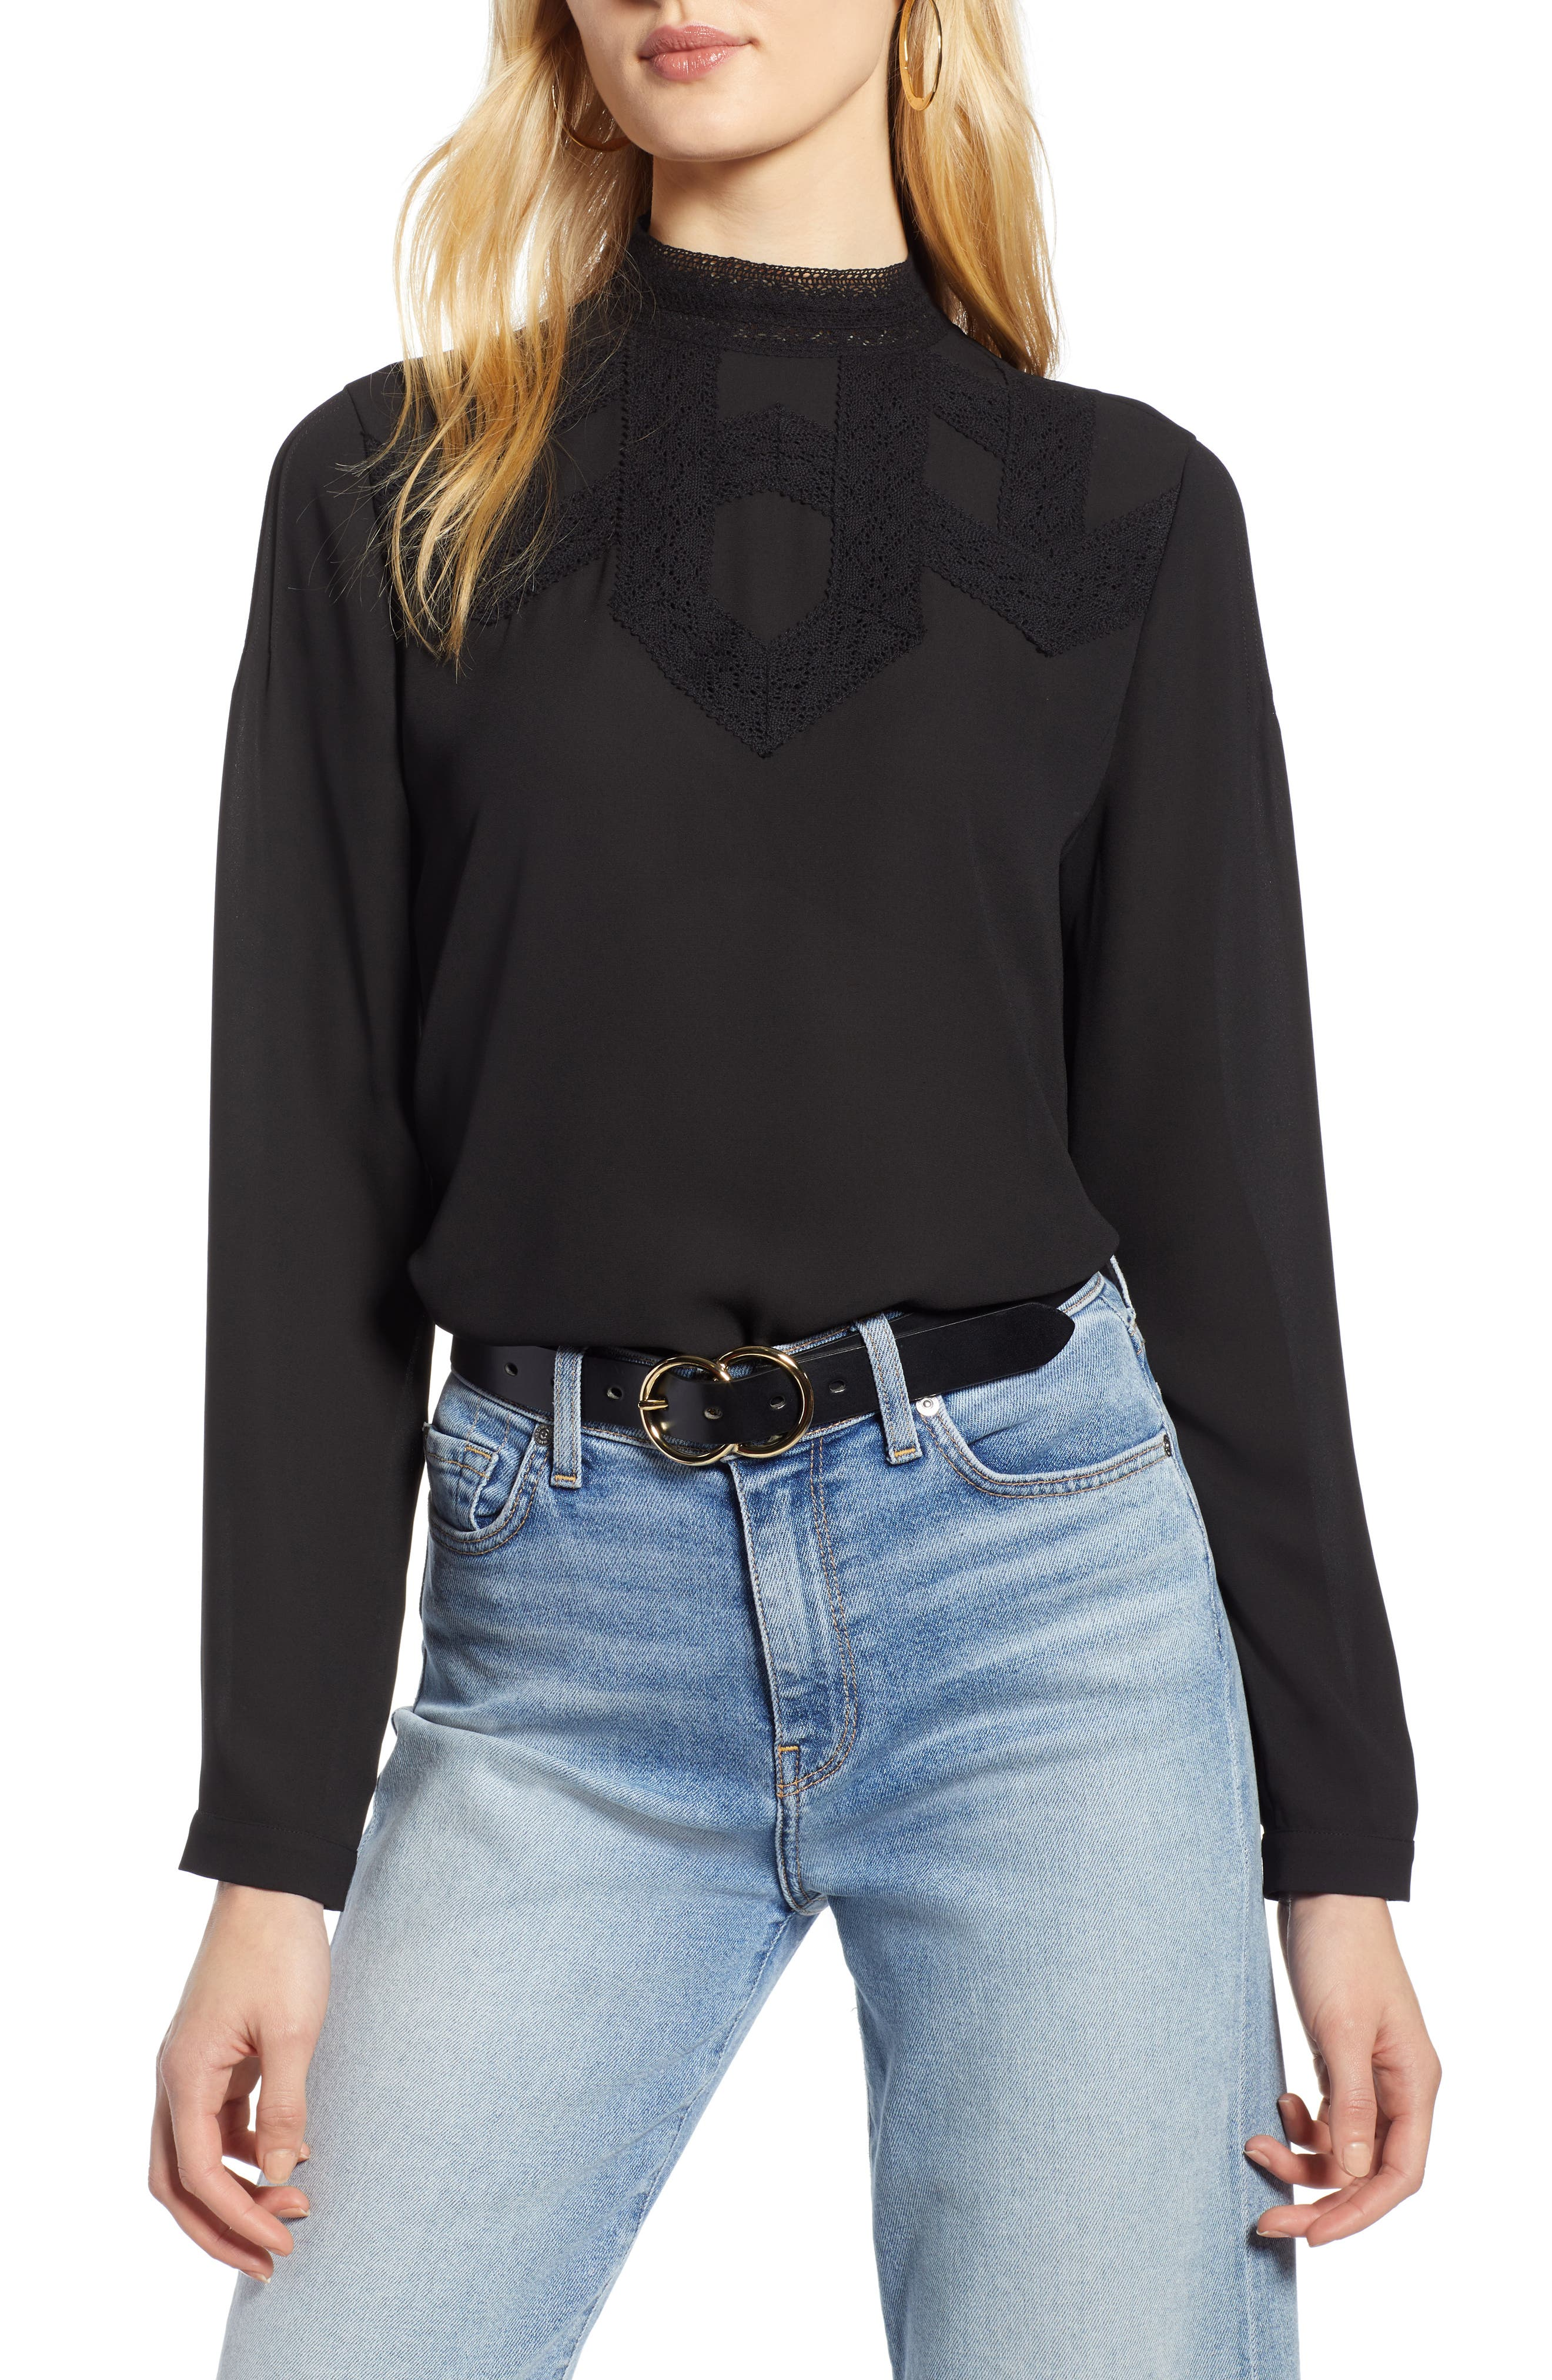 Edwardian Blouses   White & Black Lace Blouses & Sweaters Womens Halogen Lace Detail Blouse Size Small - Black $79.00 AT vintagedancer.com